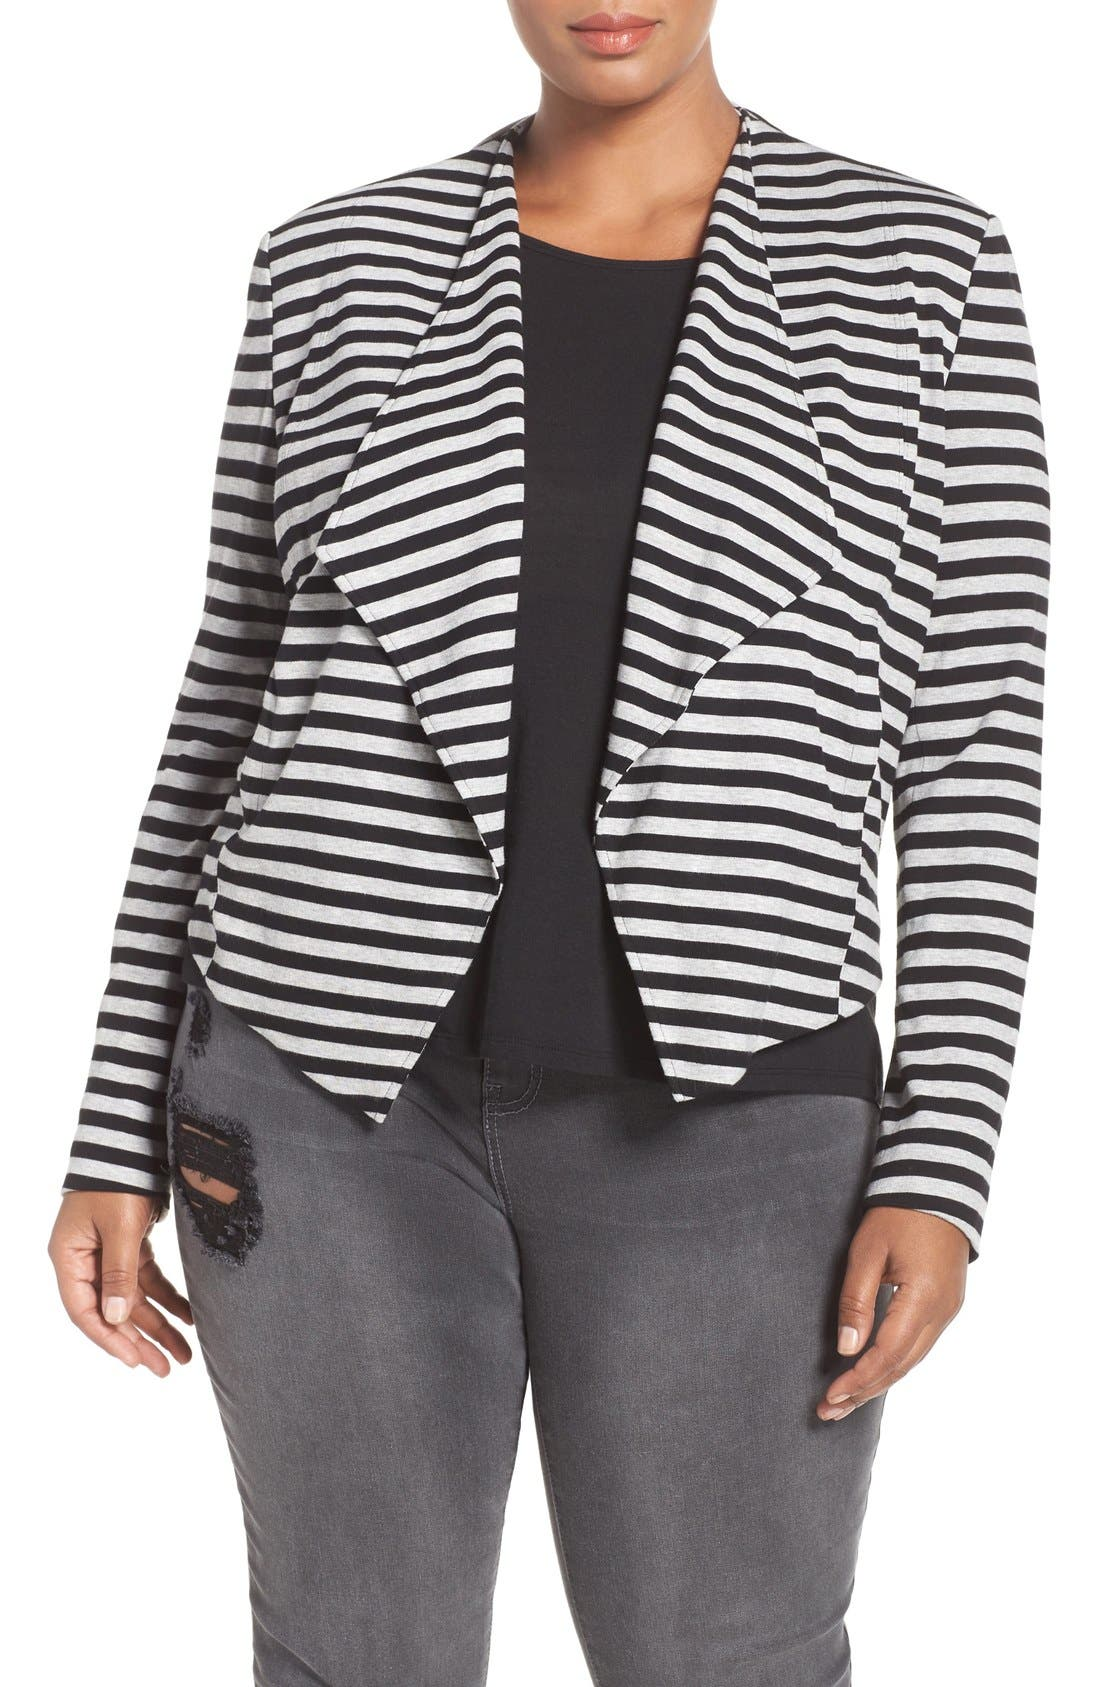 Alternate Image 1 Selected - Tart 'Veronicka' Stripe Knit Open Front Jacket (Plus Size)